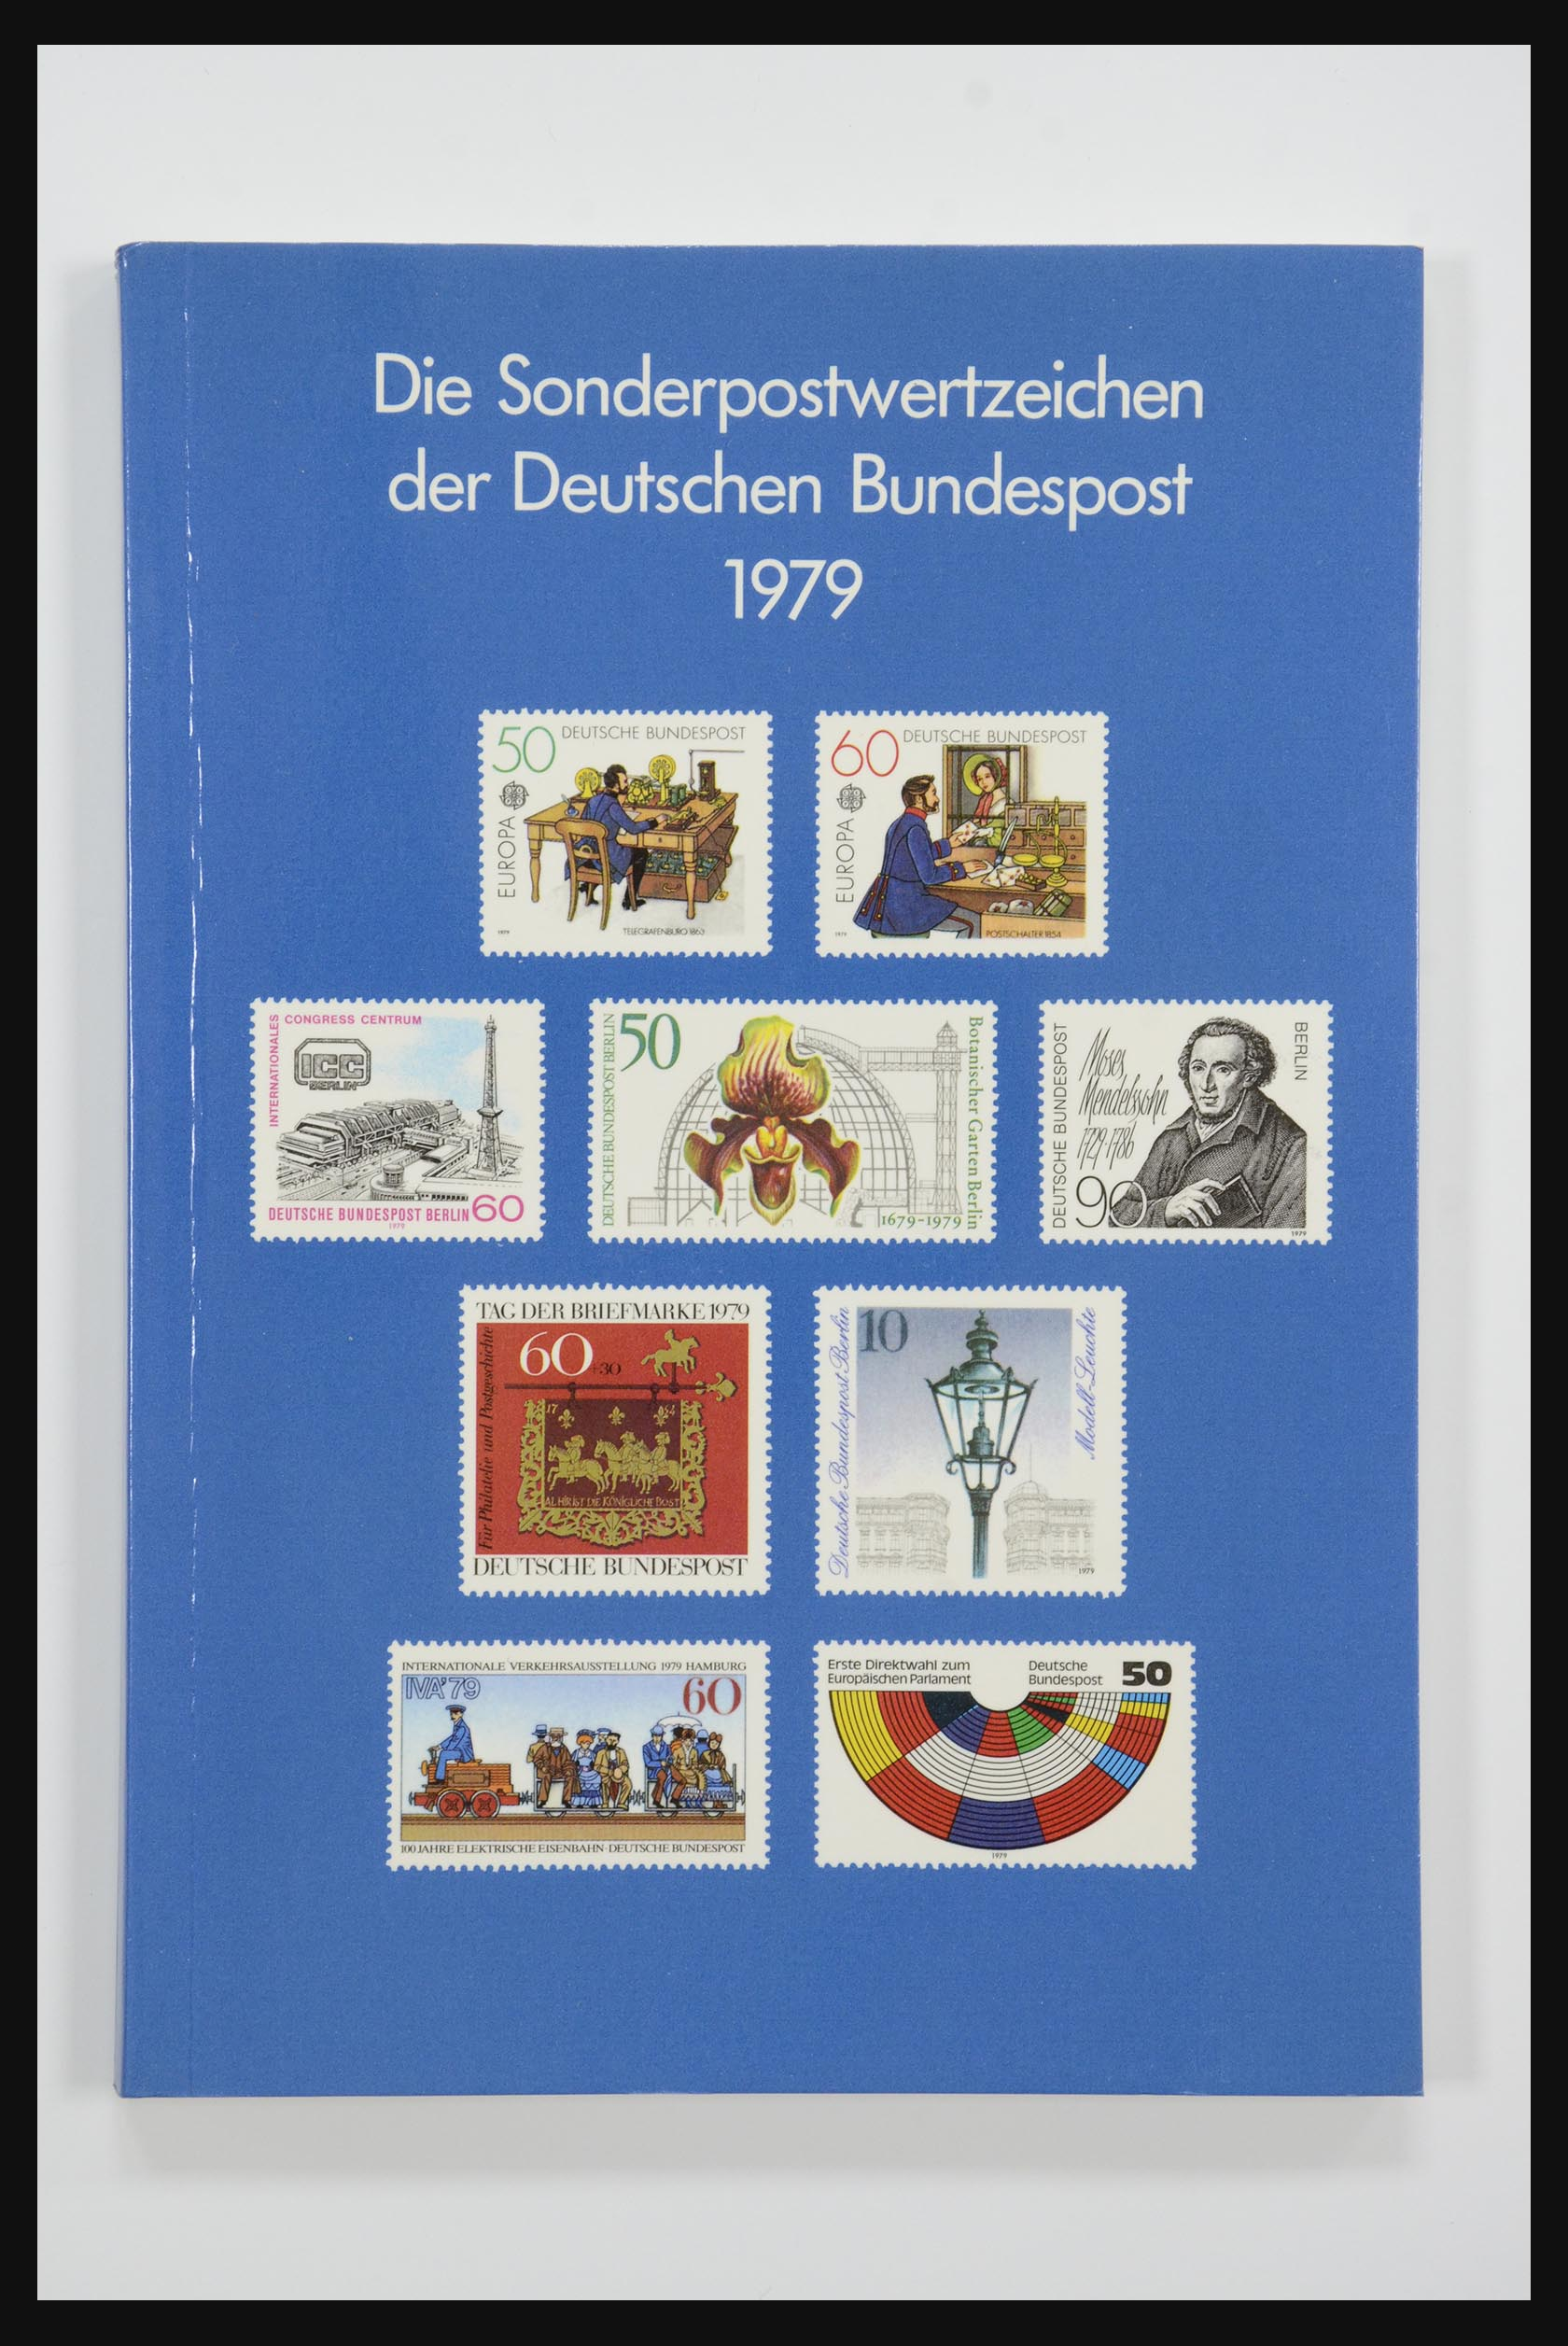 31834 007 - 31834 Bundespost yearbooks 1973(!)-1999.